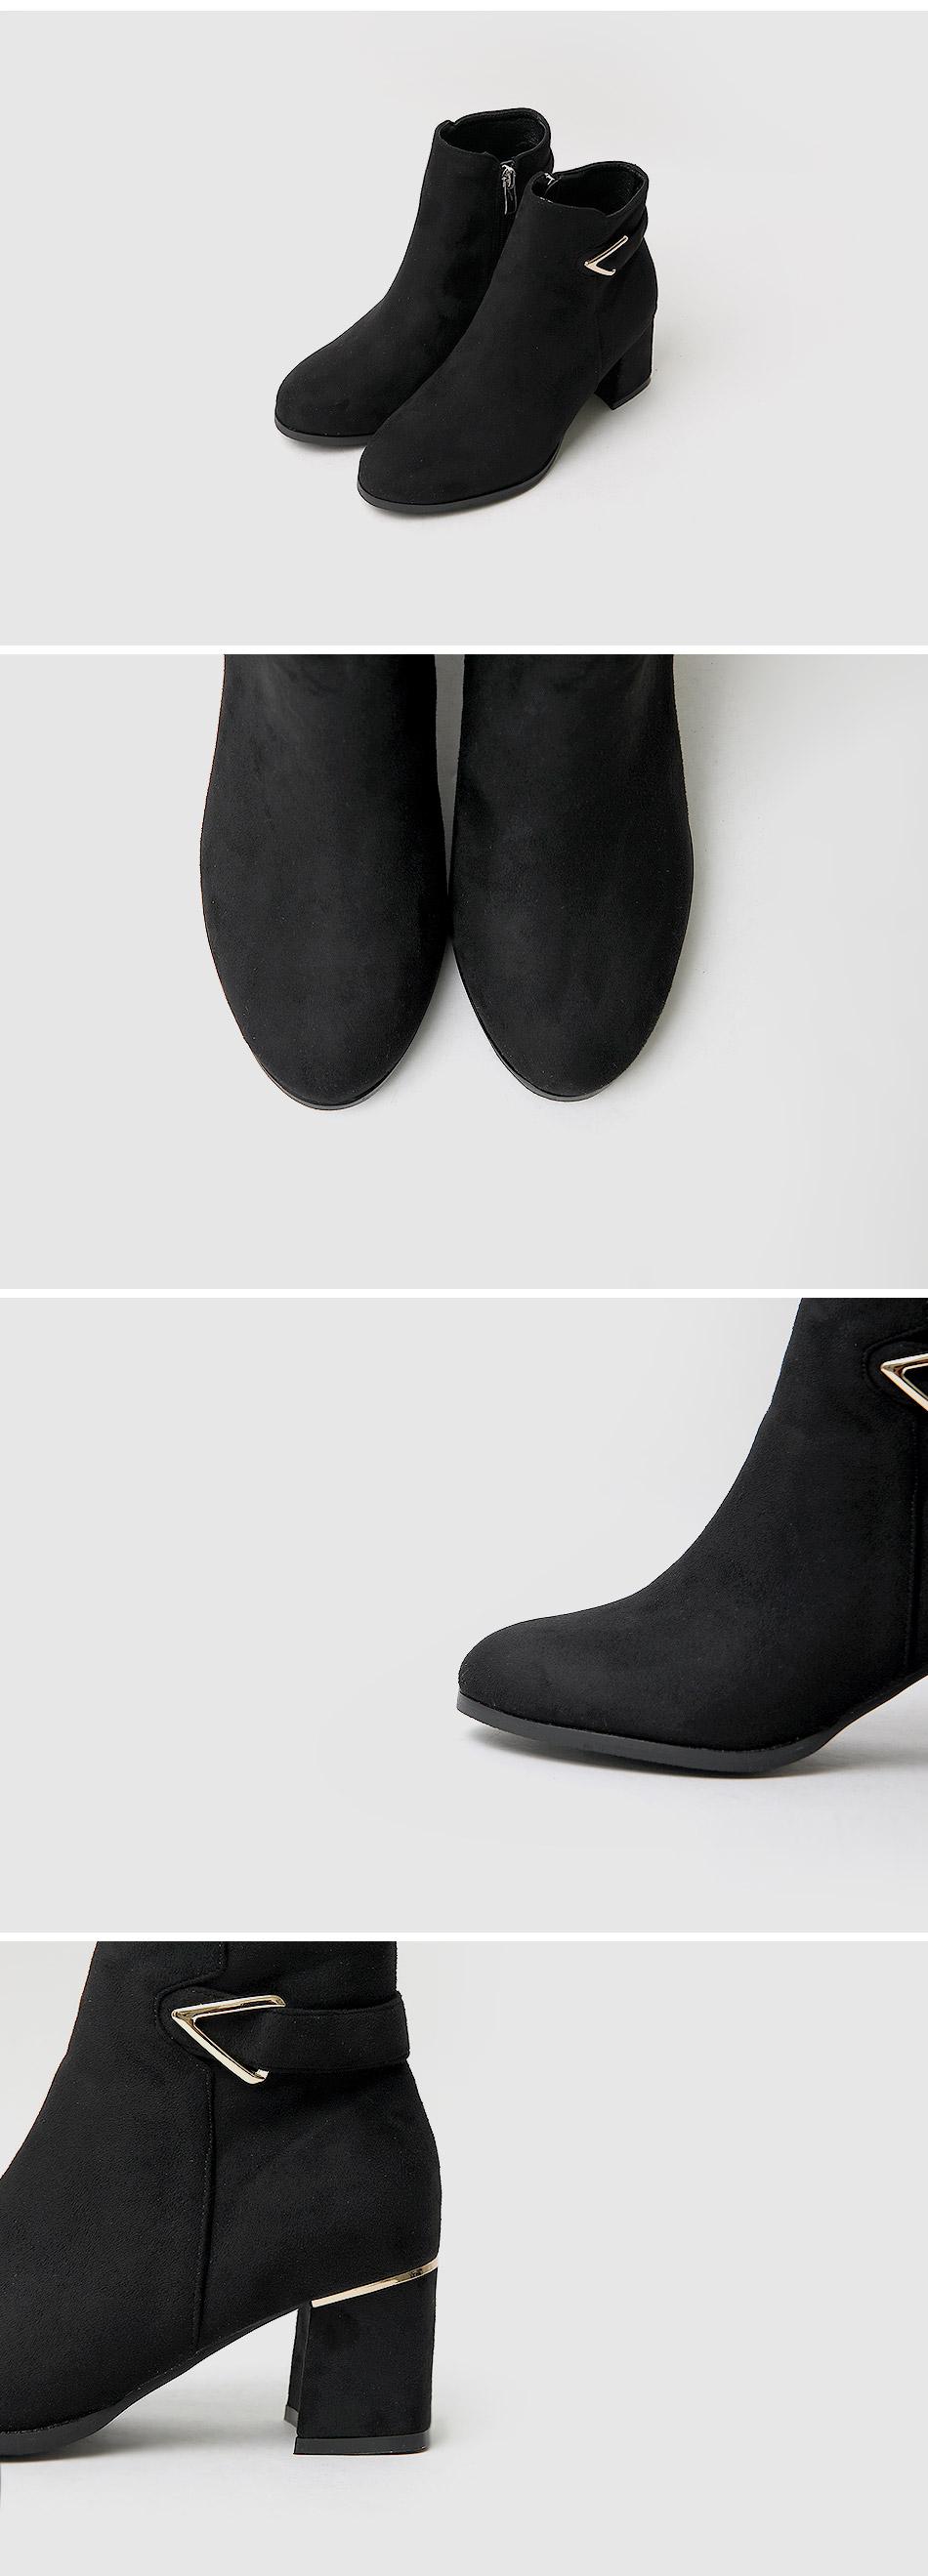 Friends Ankle Boots 6cm